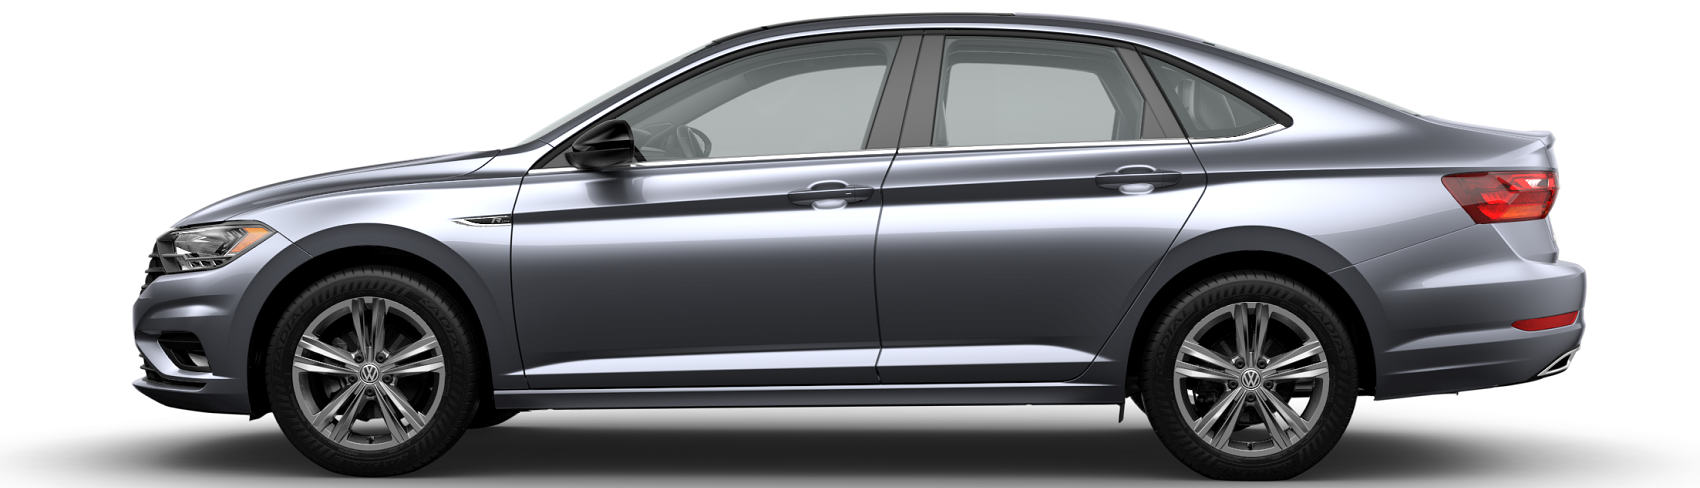 2019 Volkswagen Jetta Platinum Gray